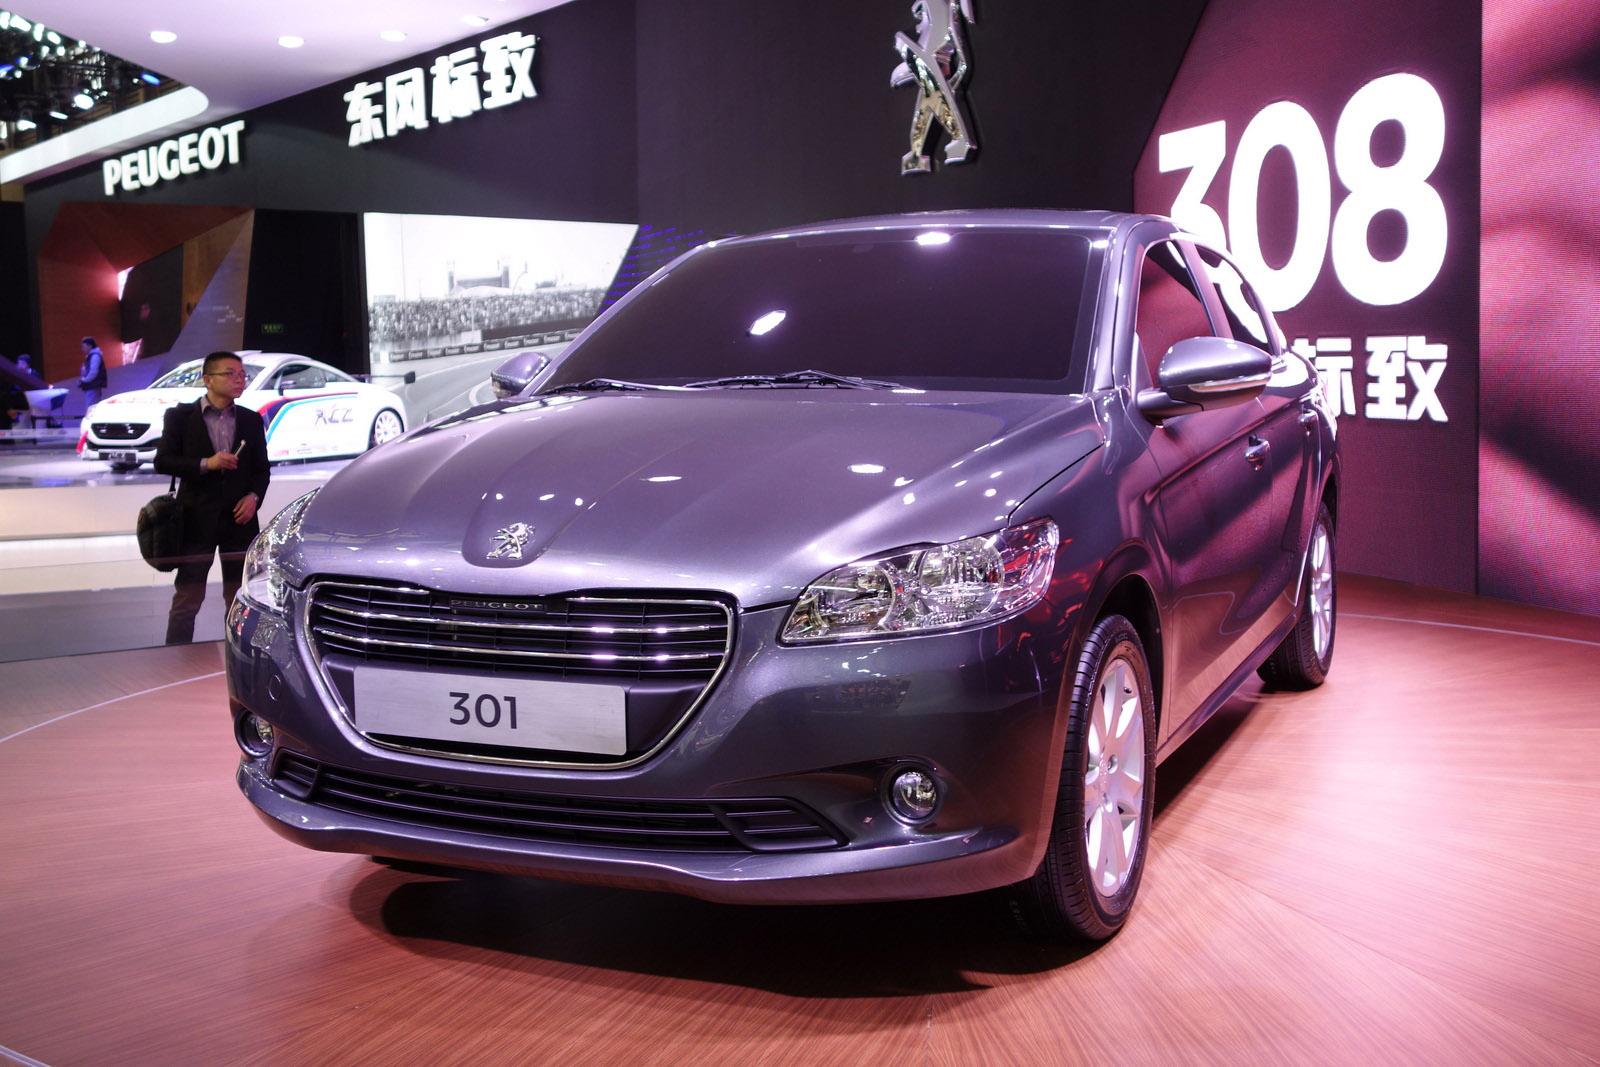 Peugeot 301 Shanghai 2013 - Picture 84604